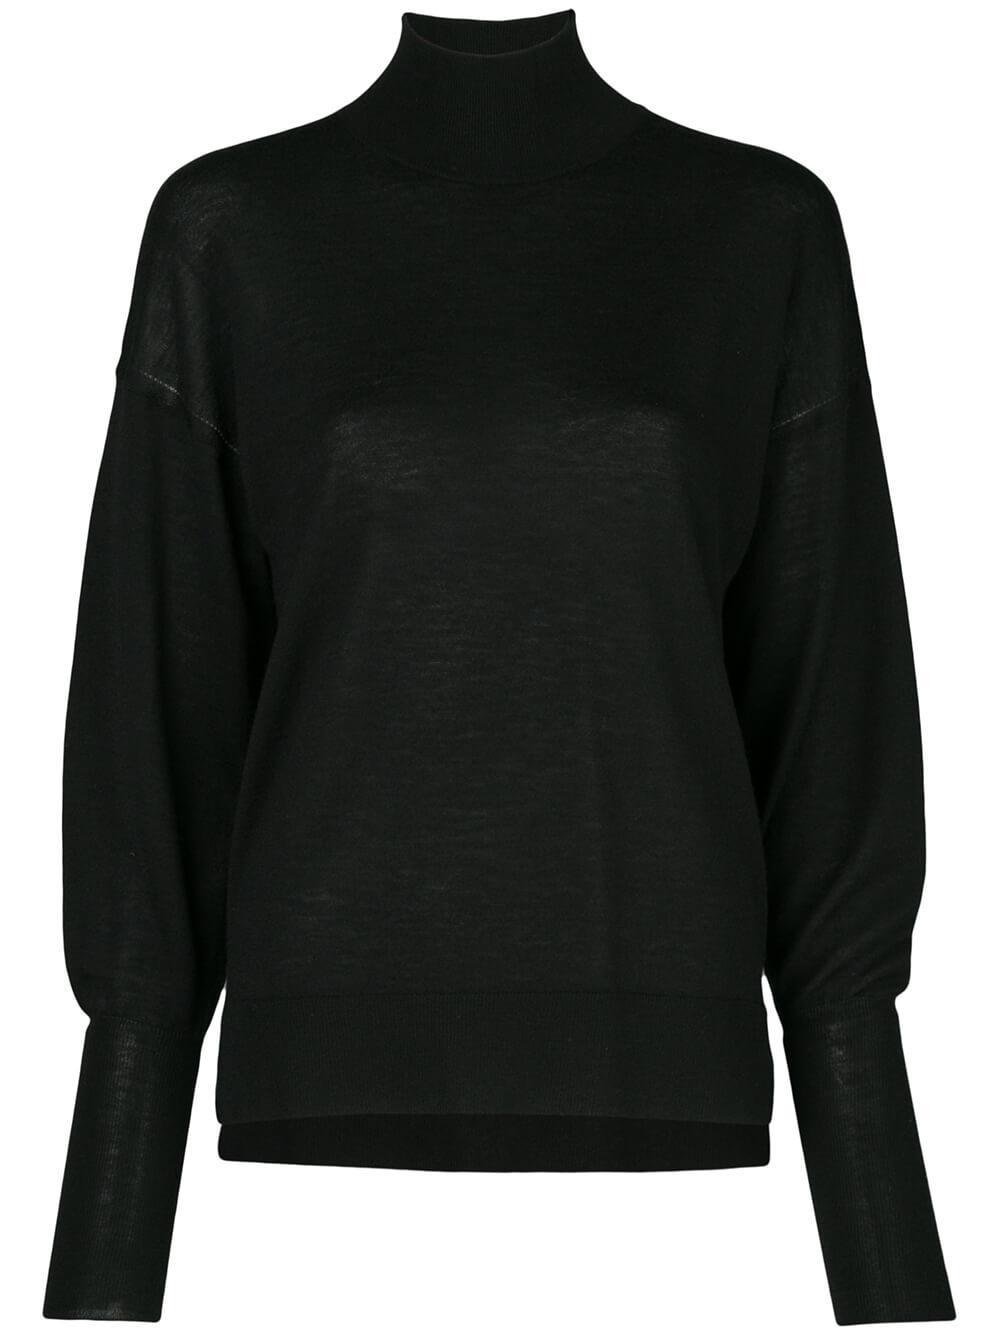 Long Sleeve Cashmere Cowl Back Sweater Item # 120-2030-K